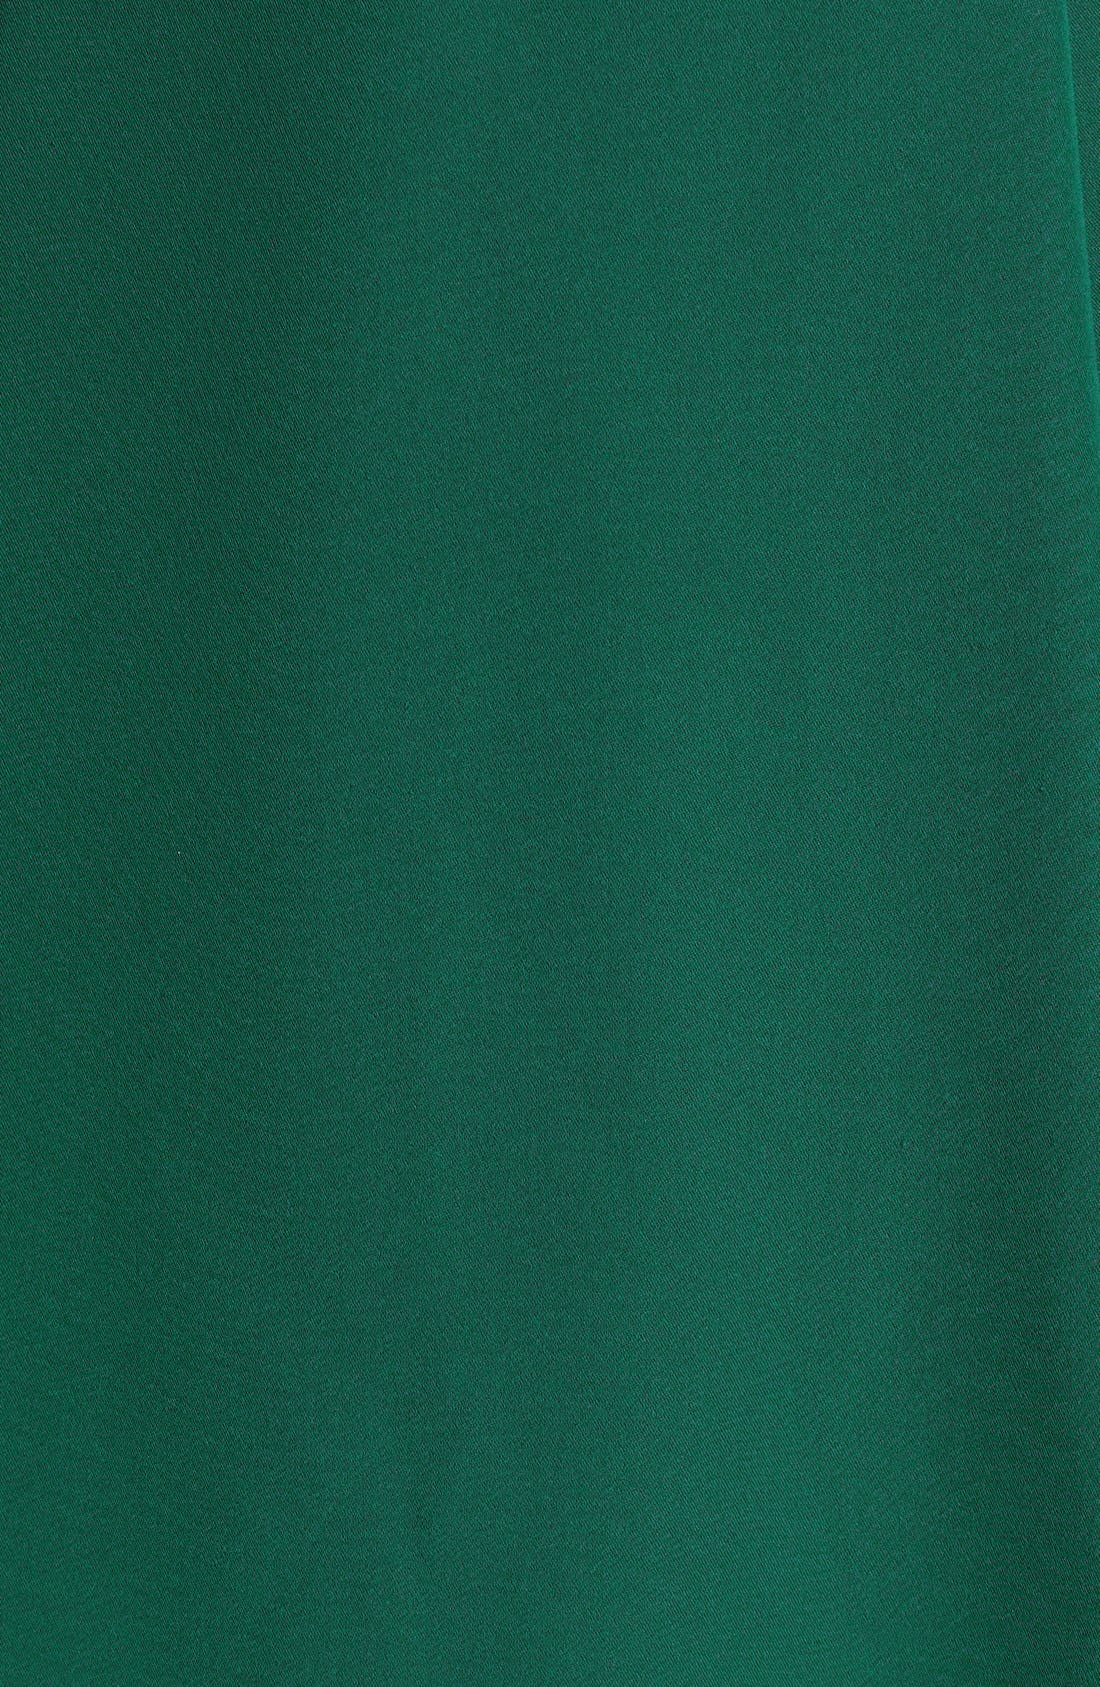 Alternate Image 3  - Vince Camuto Fit & Flare Dress (Regular & Petite)